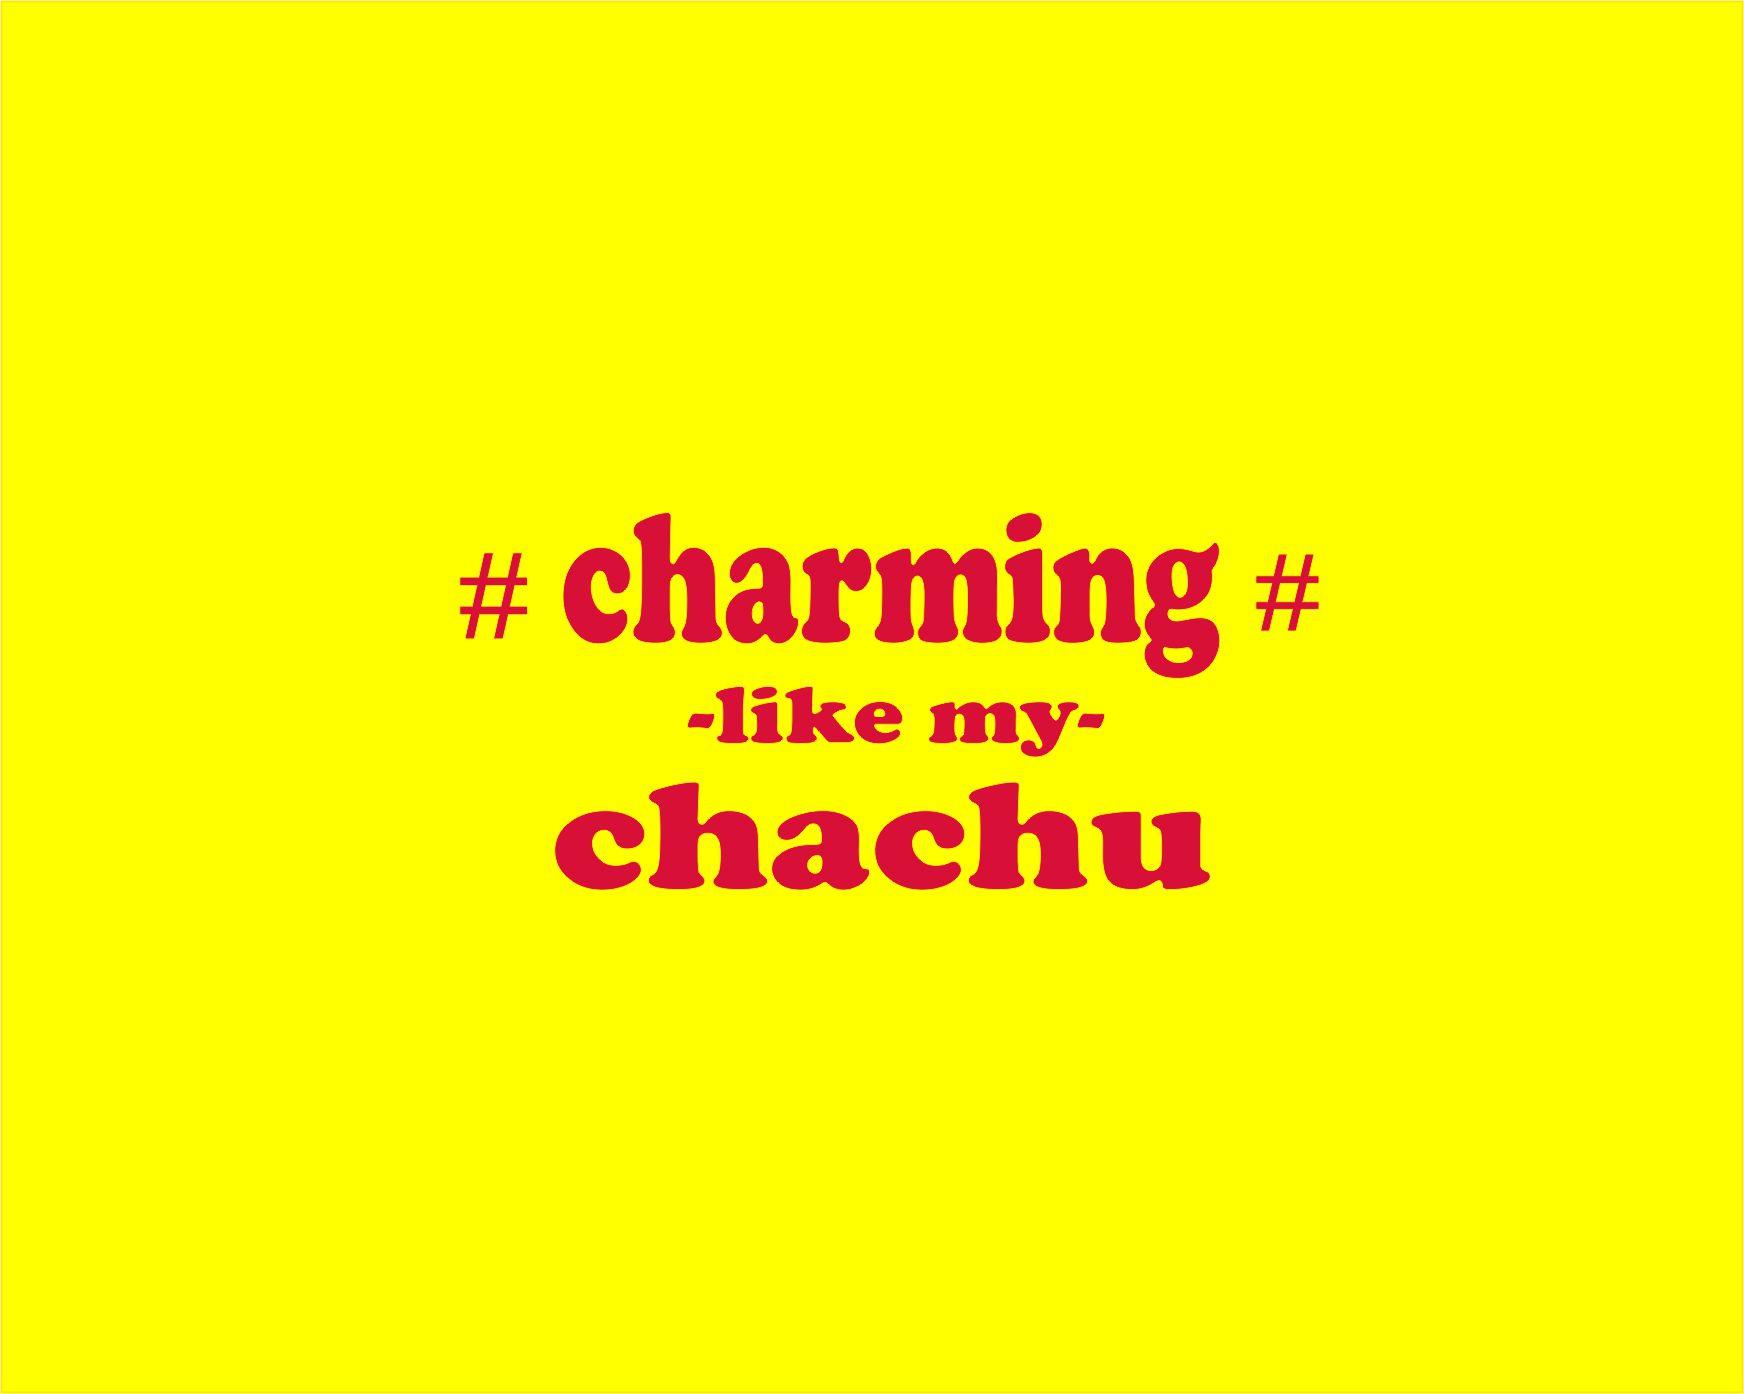 CHARMING LIKE CHACHU.jpg